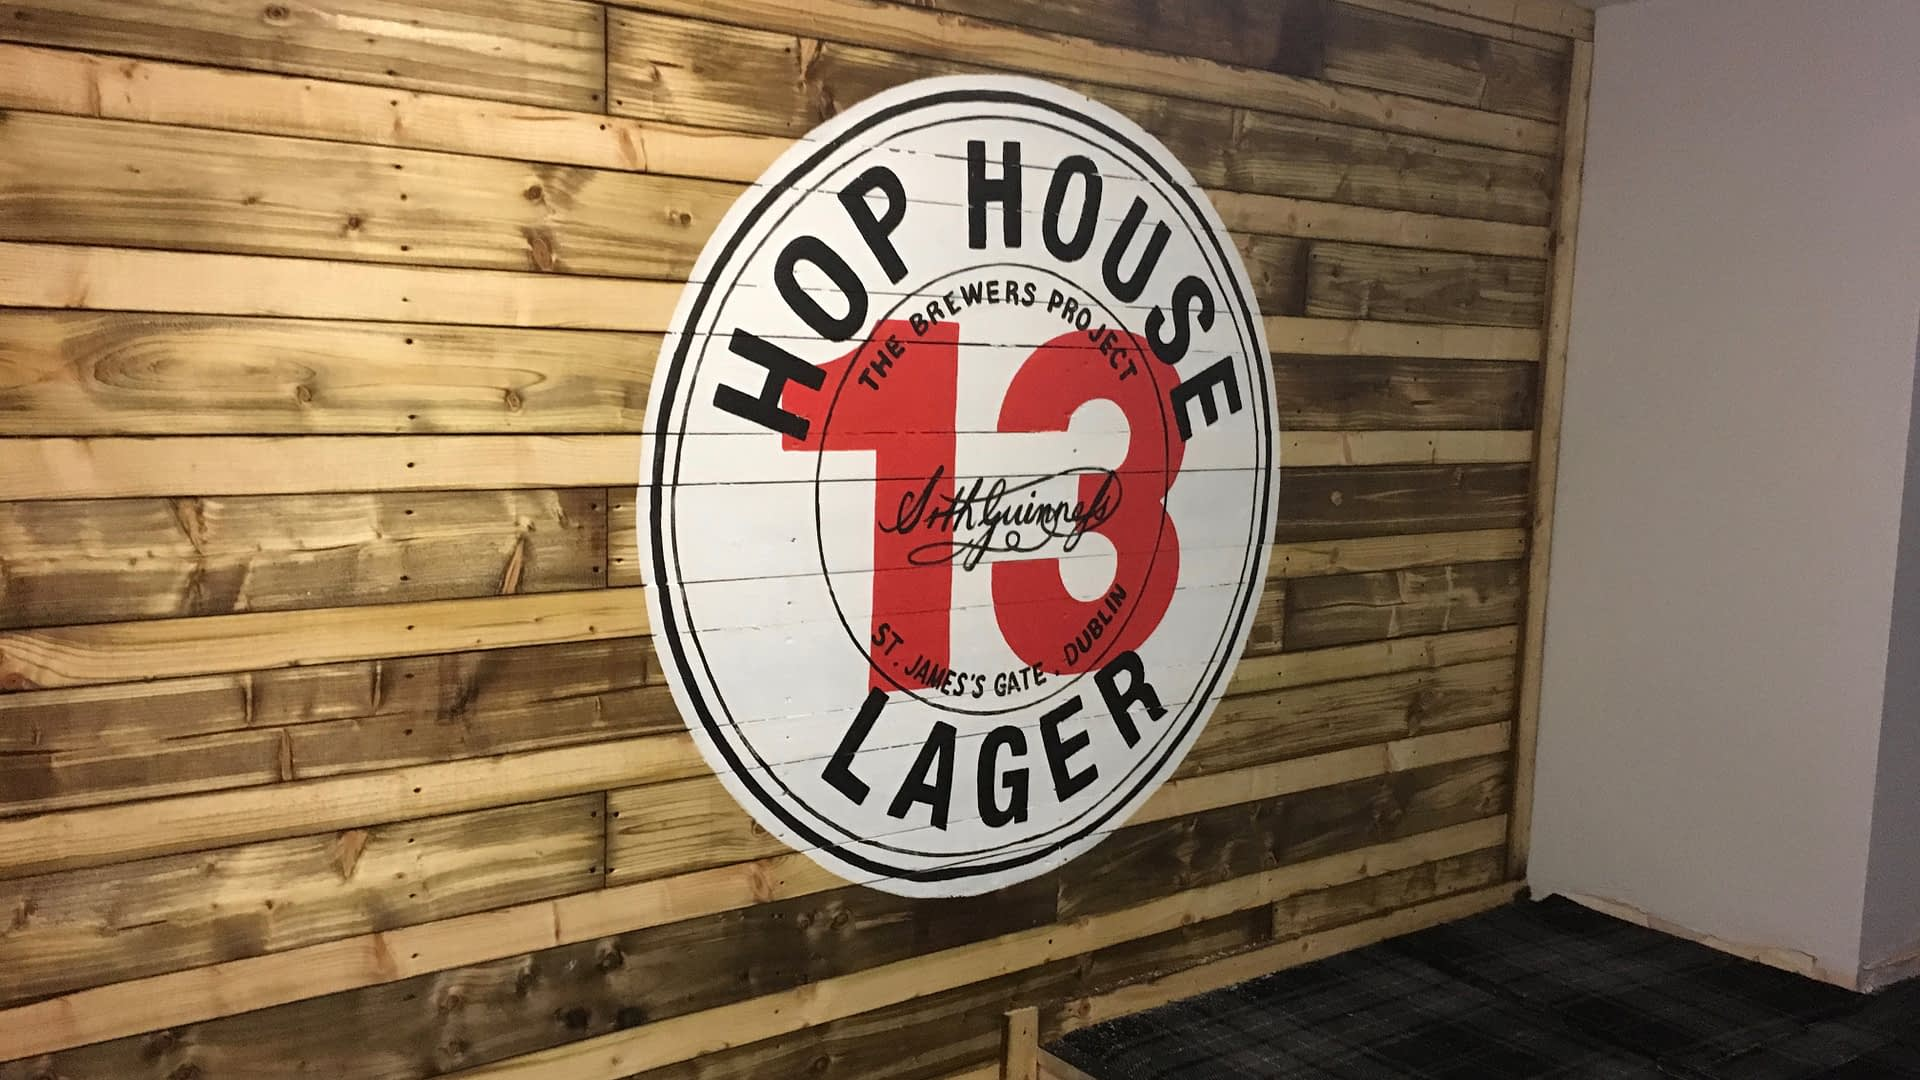 Hop House 13 ( The Dead Rabbit Sunderland )